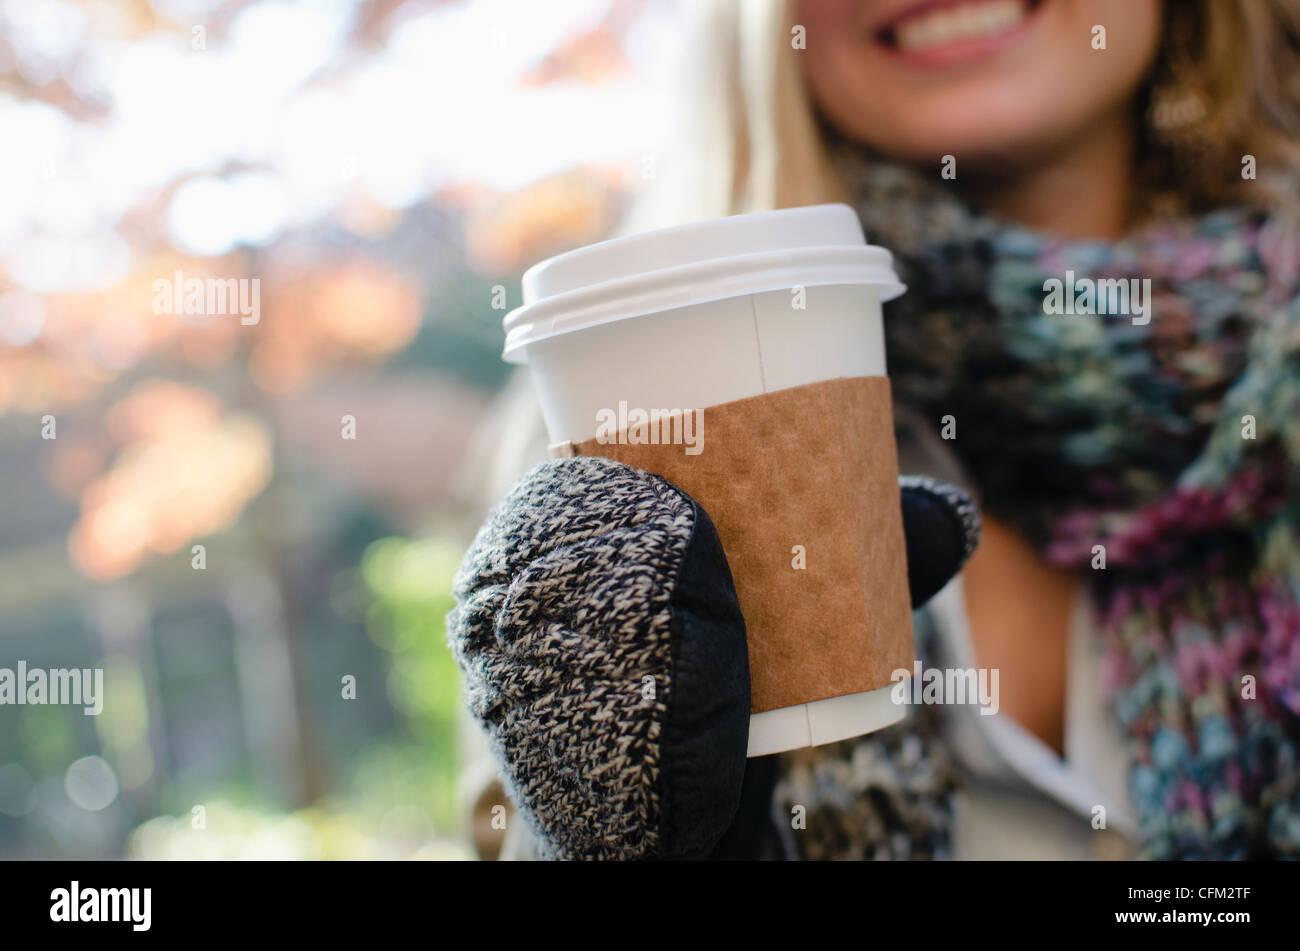 USA, l'État de New York, New York City, Brooklyn, Femme portant des gants holding Coffee cup Banque D'Images